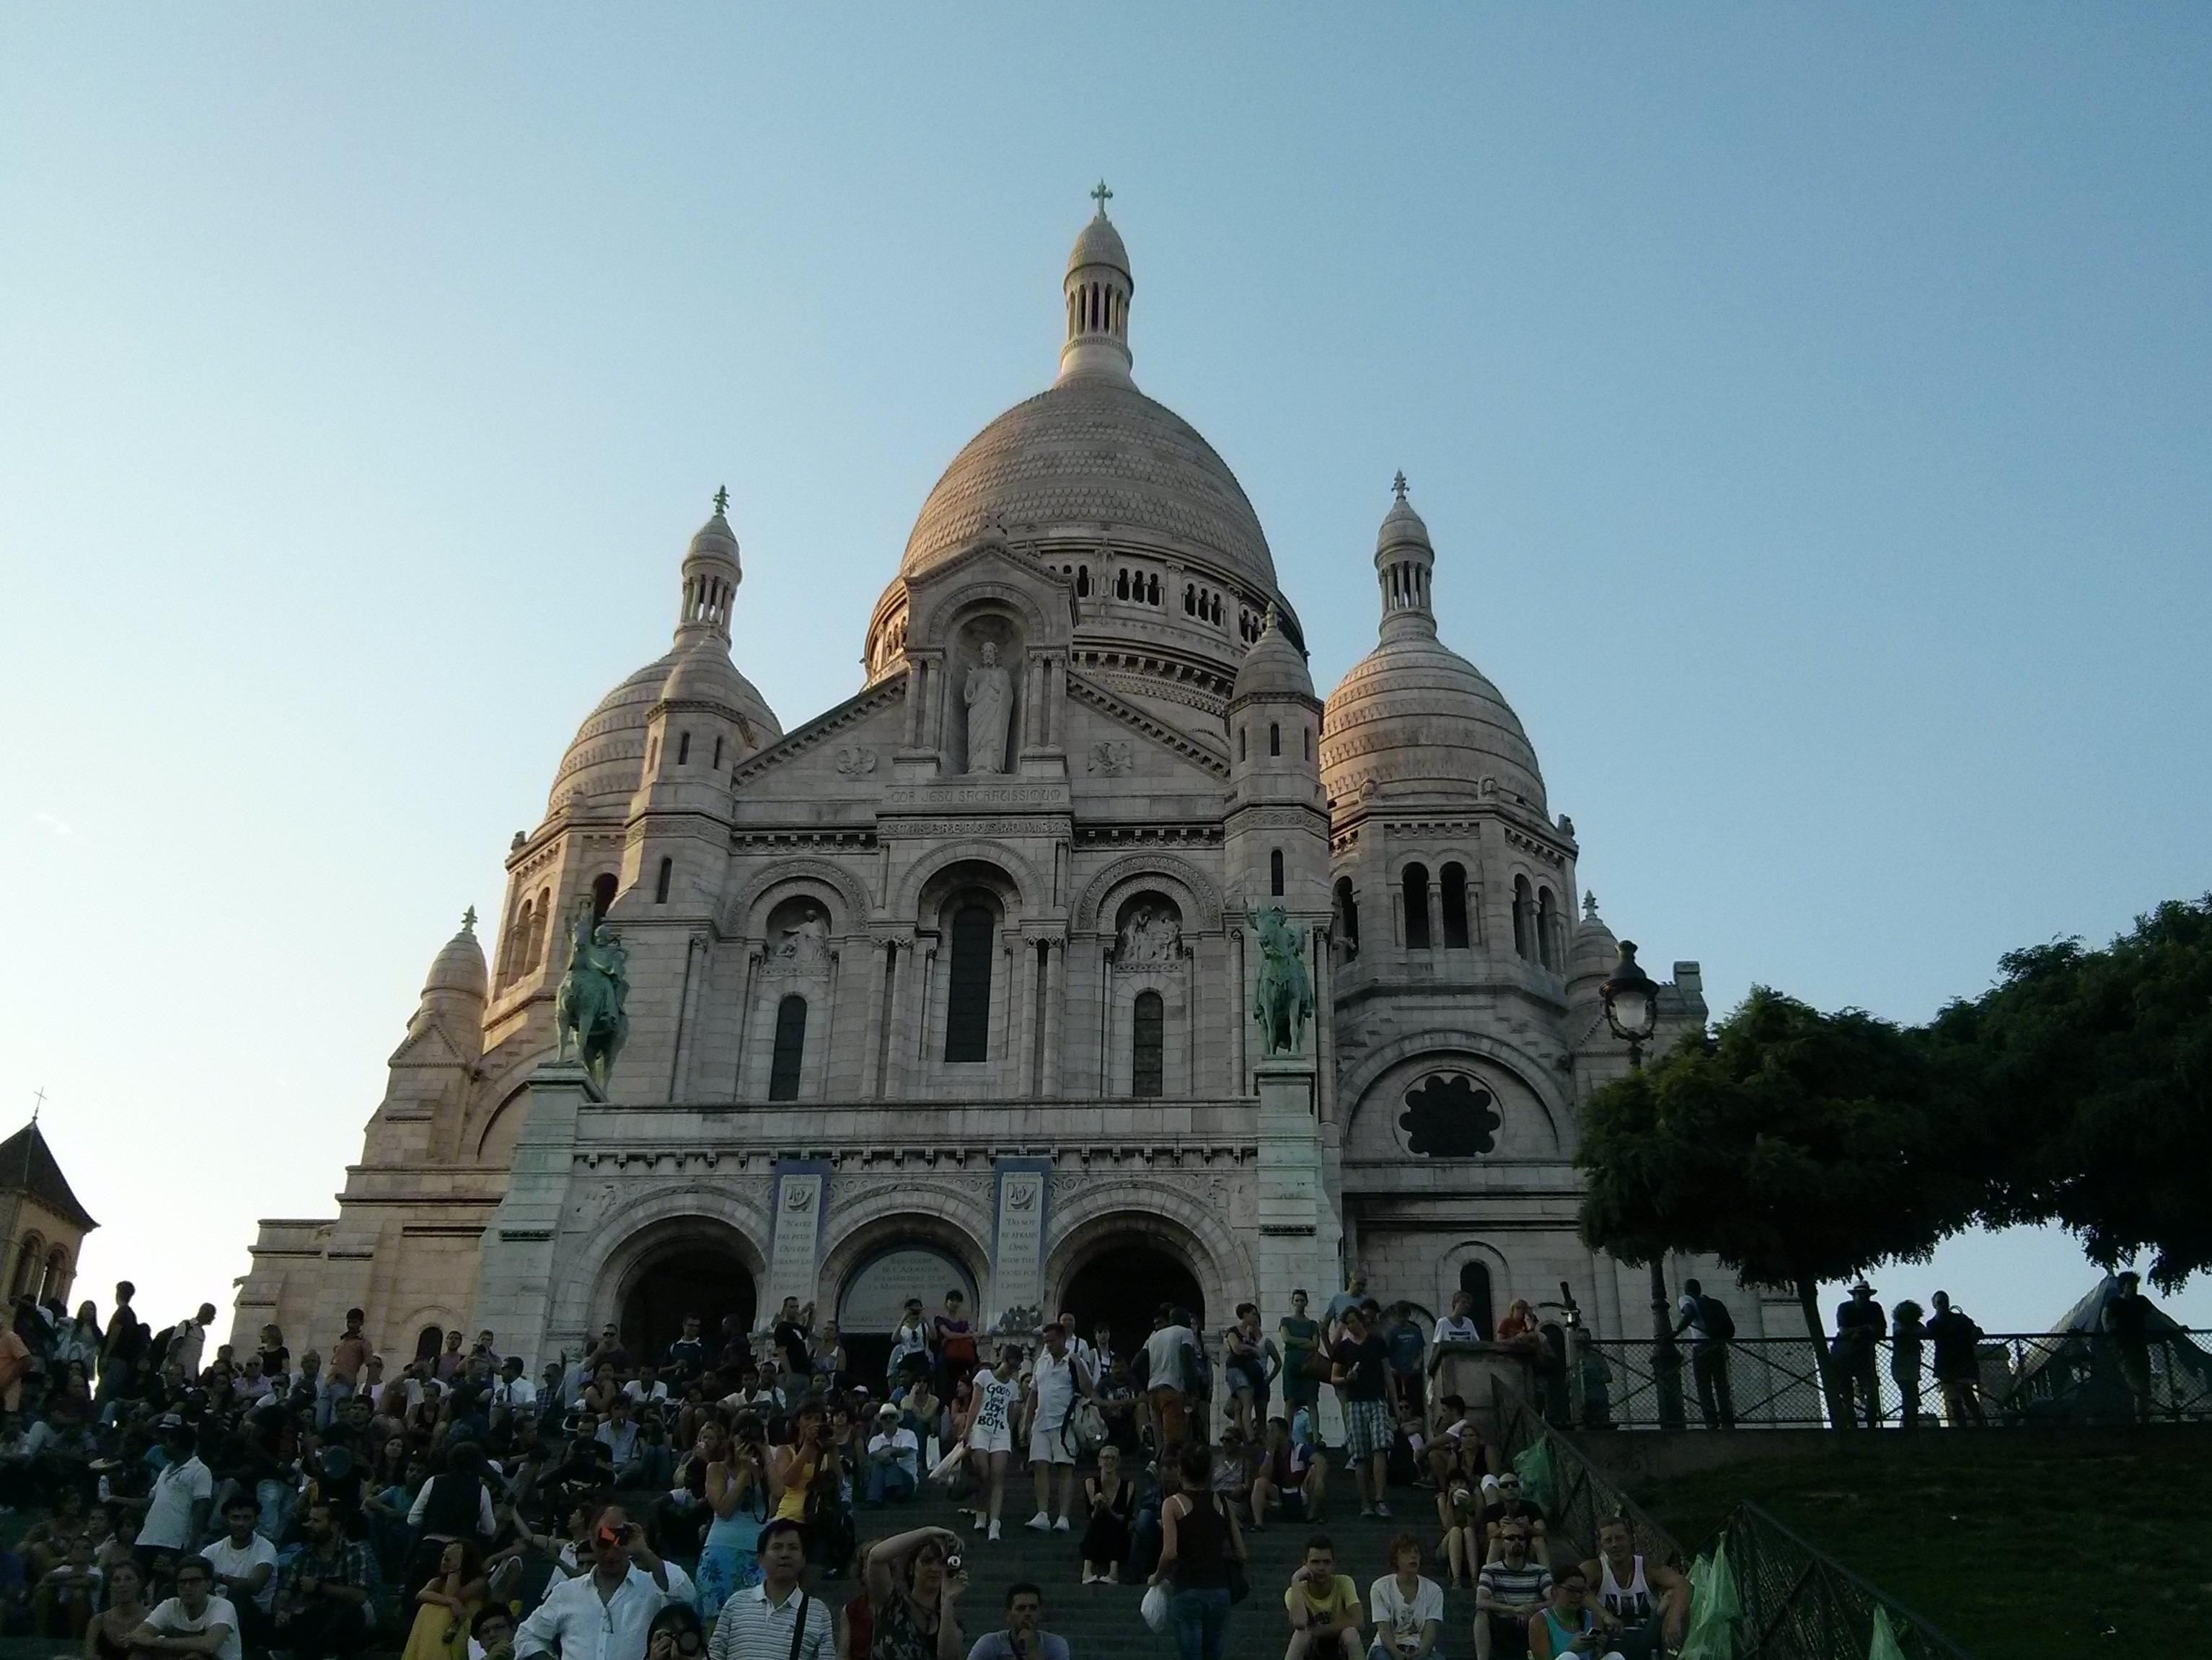 Un itinerario per visitare Parigi - Sacre Coeur a Montmartre